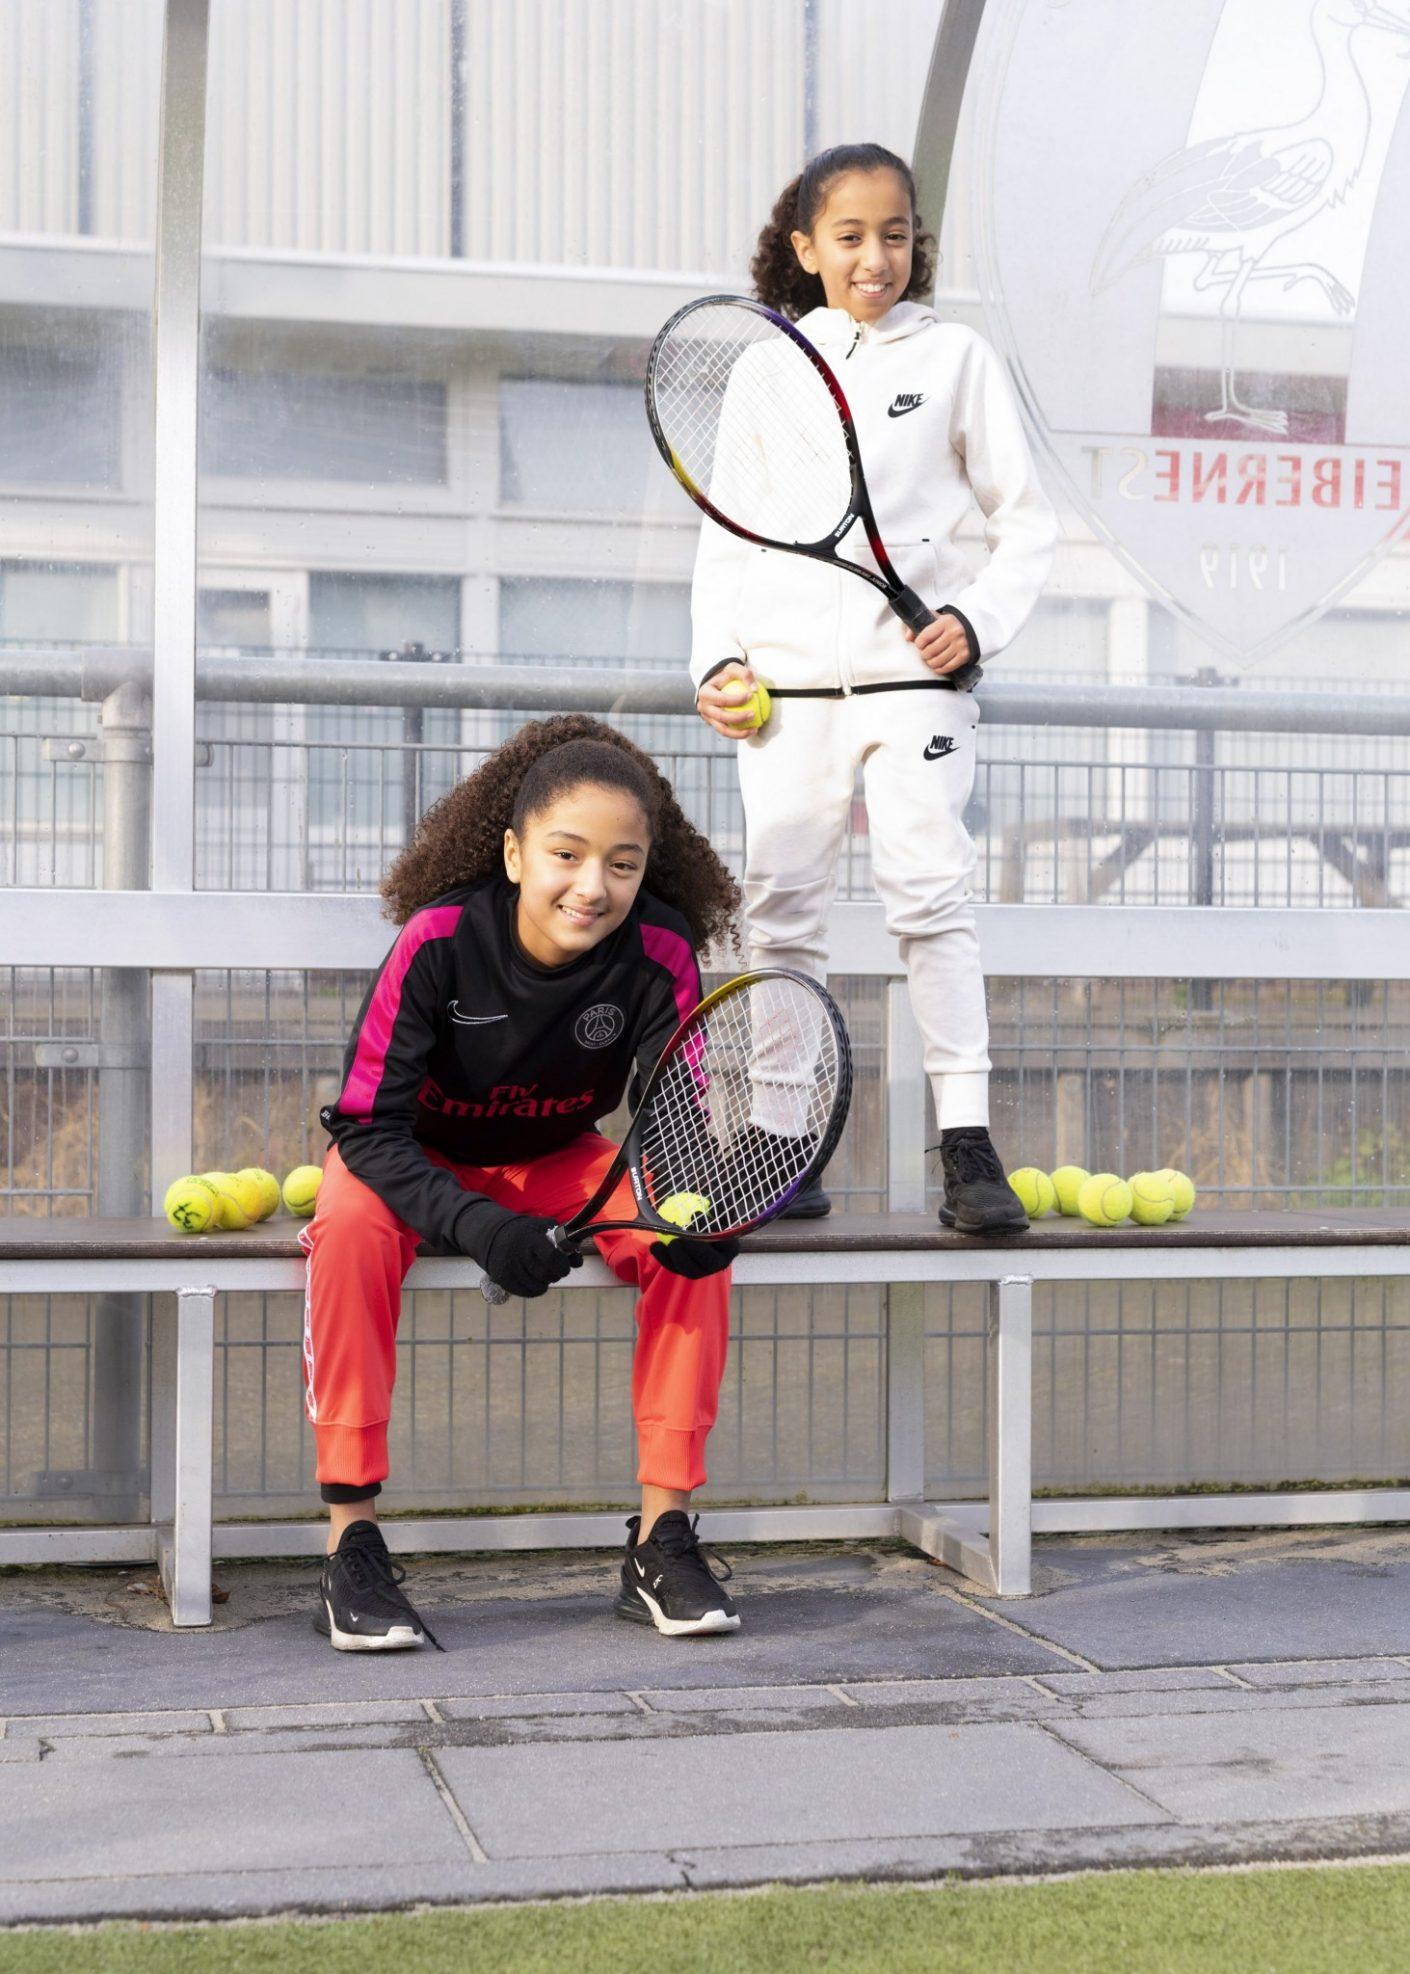 Campagne Haags Sportkwartier